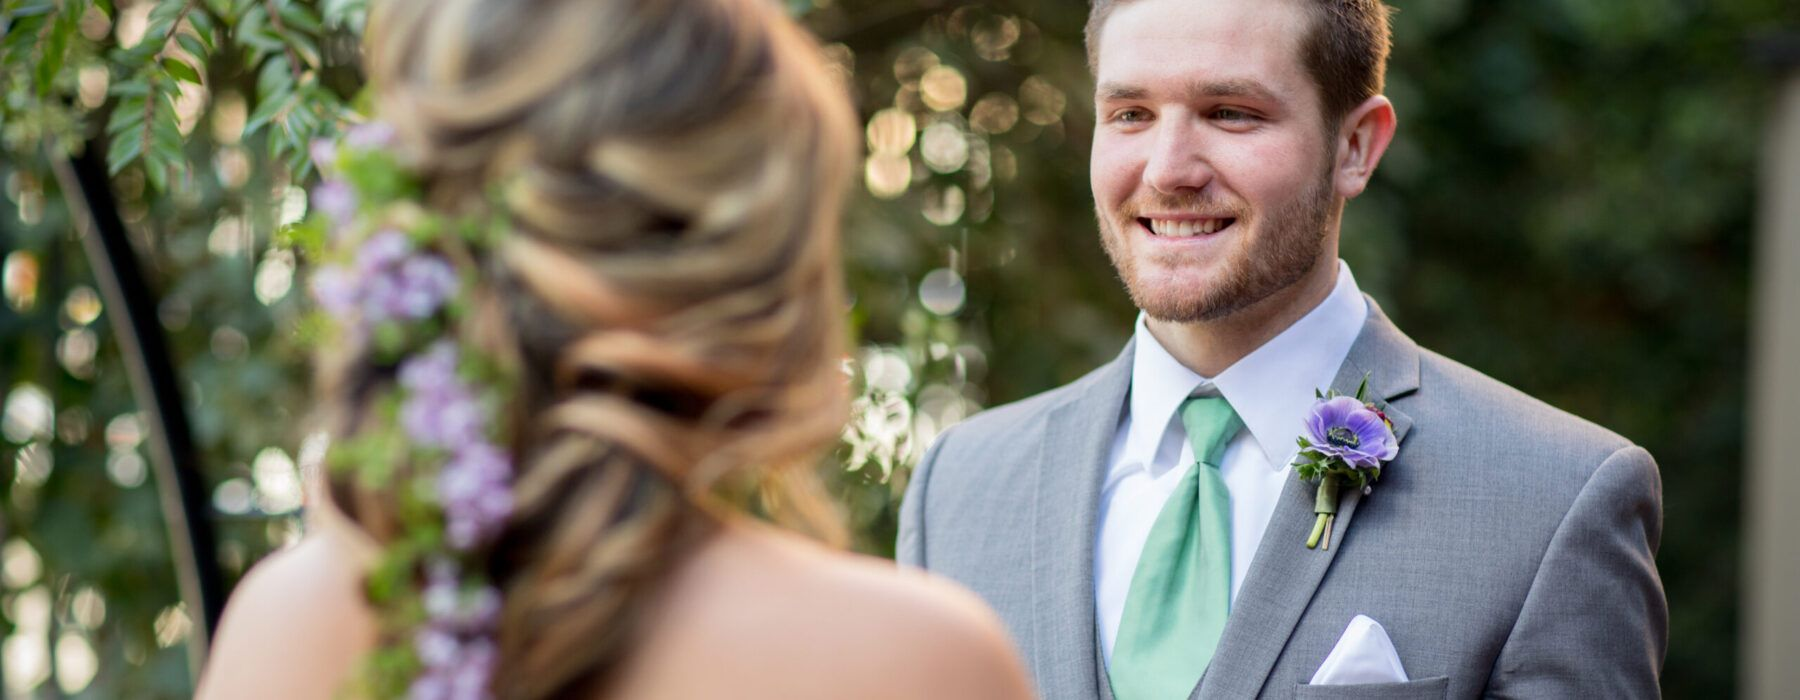 Wedding-2073